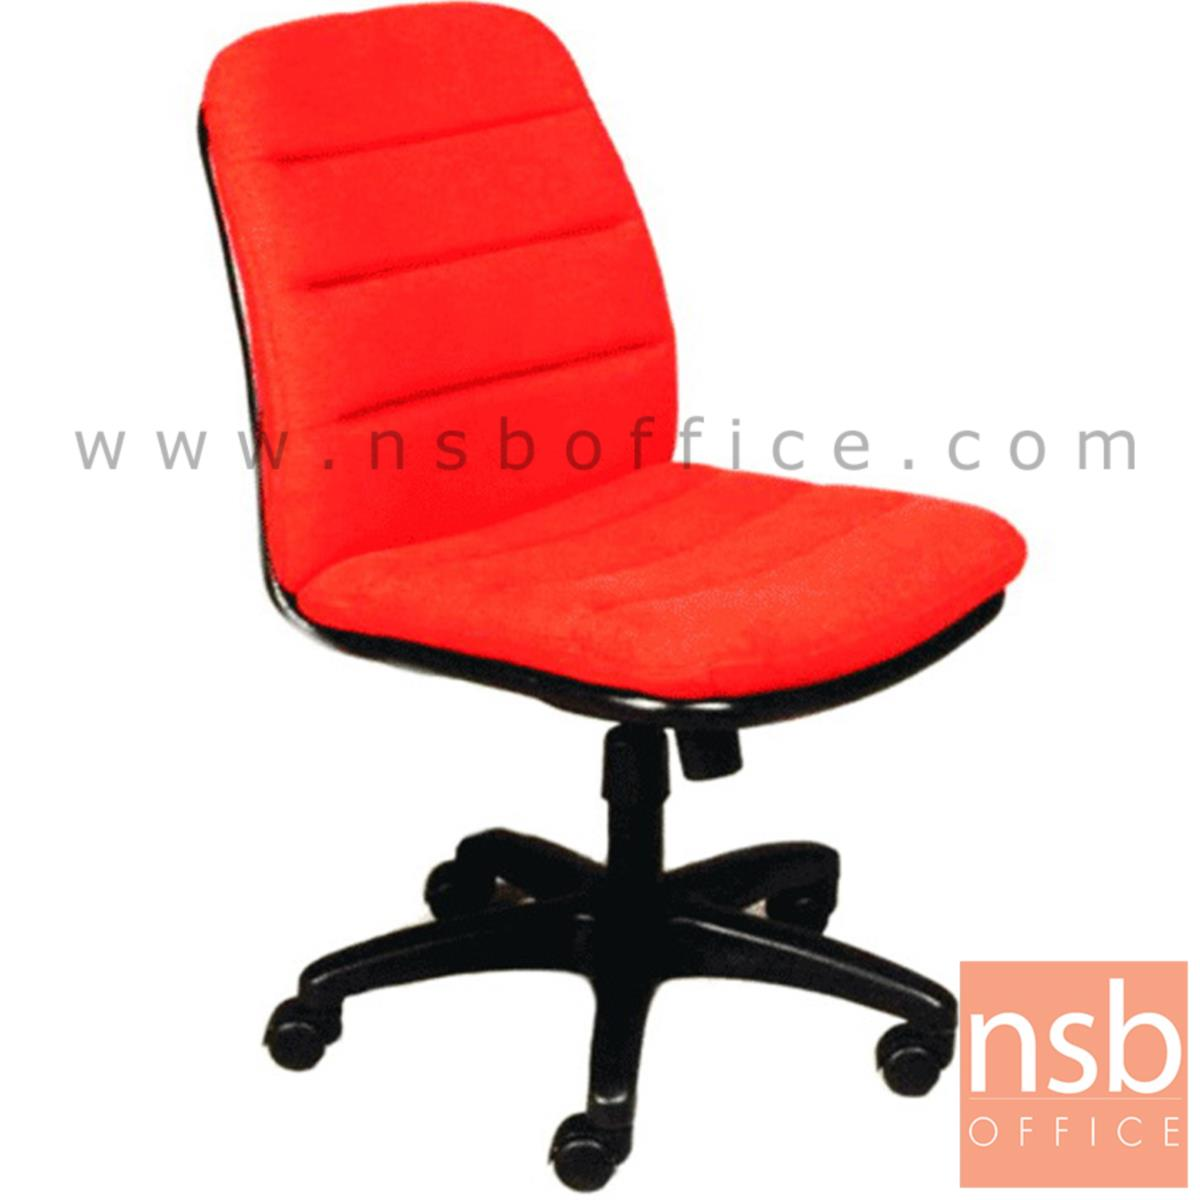 B03A349:เก้าอี้สำนักงาน รุ่น Brener (เบรนเนอร์)  มีก้อนโยก ขาพลาสติก